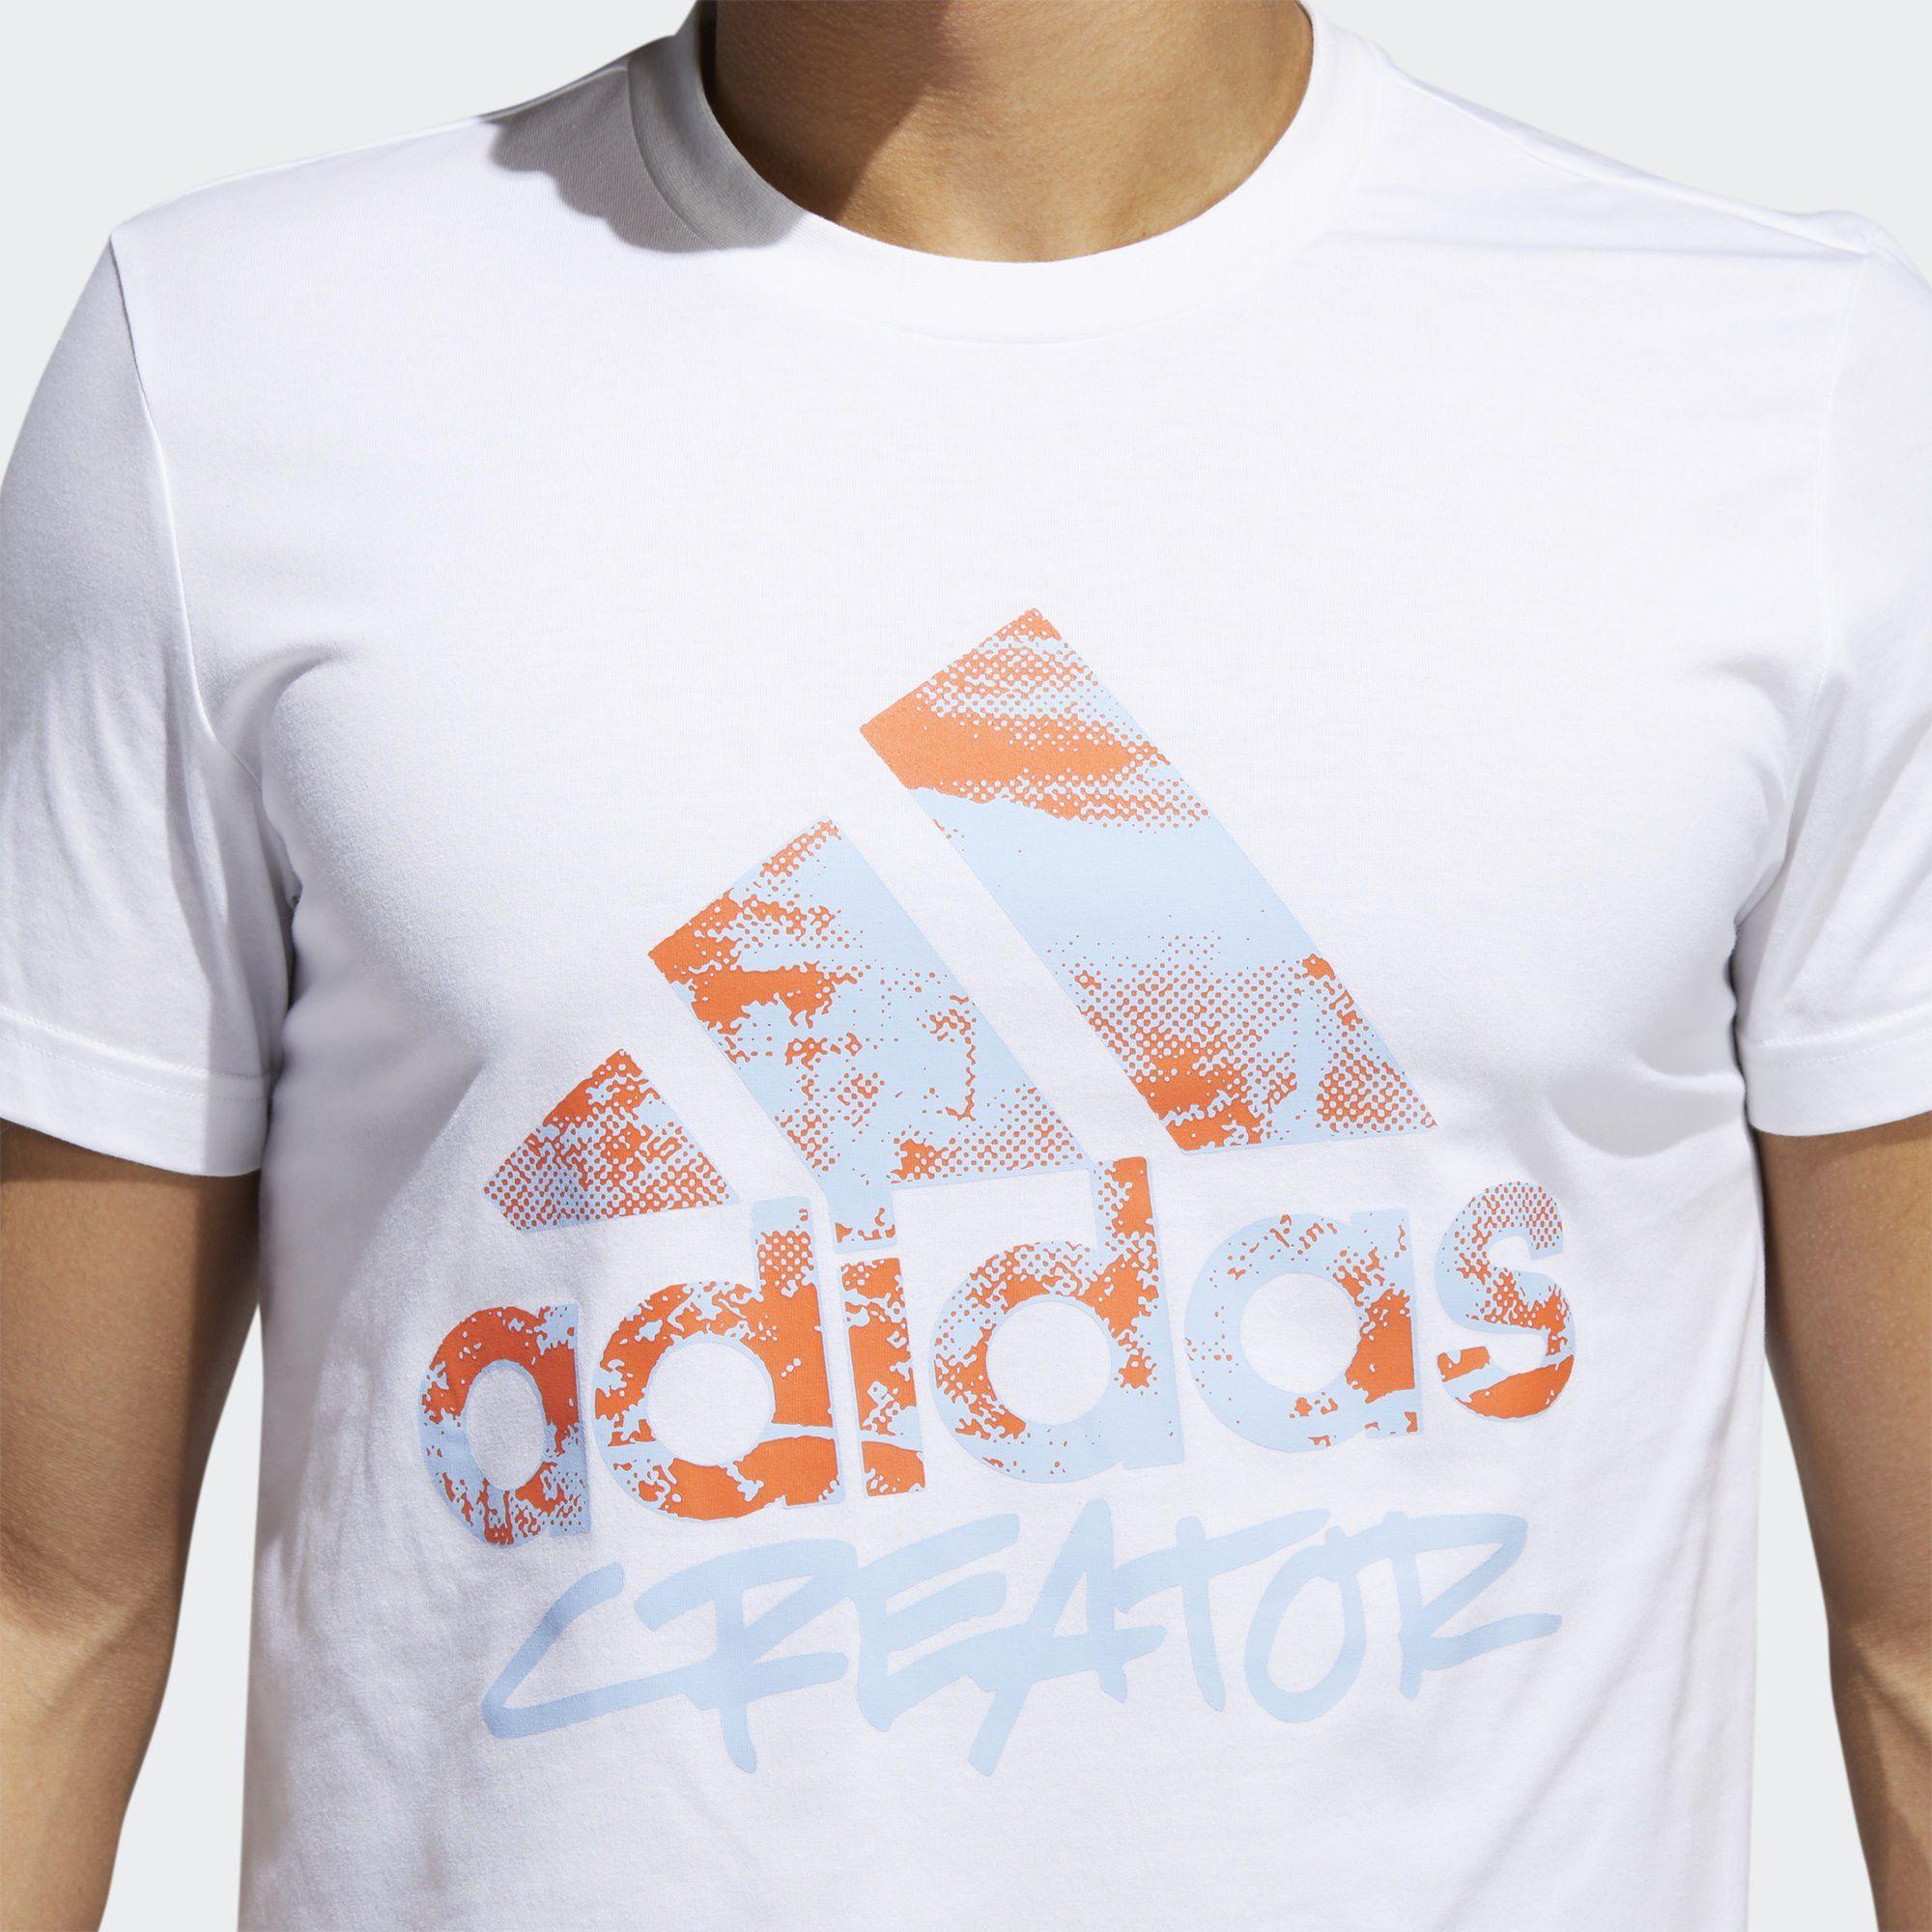 shirt« shirt Kaufen »not Performance Logo Adidas Graphic T T Online Same g7yYbfv6